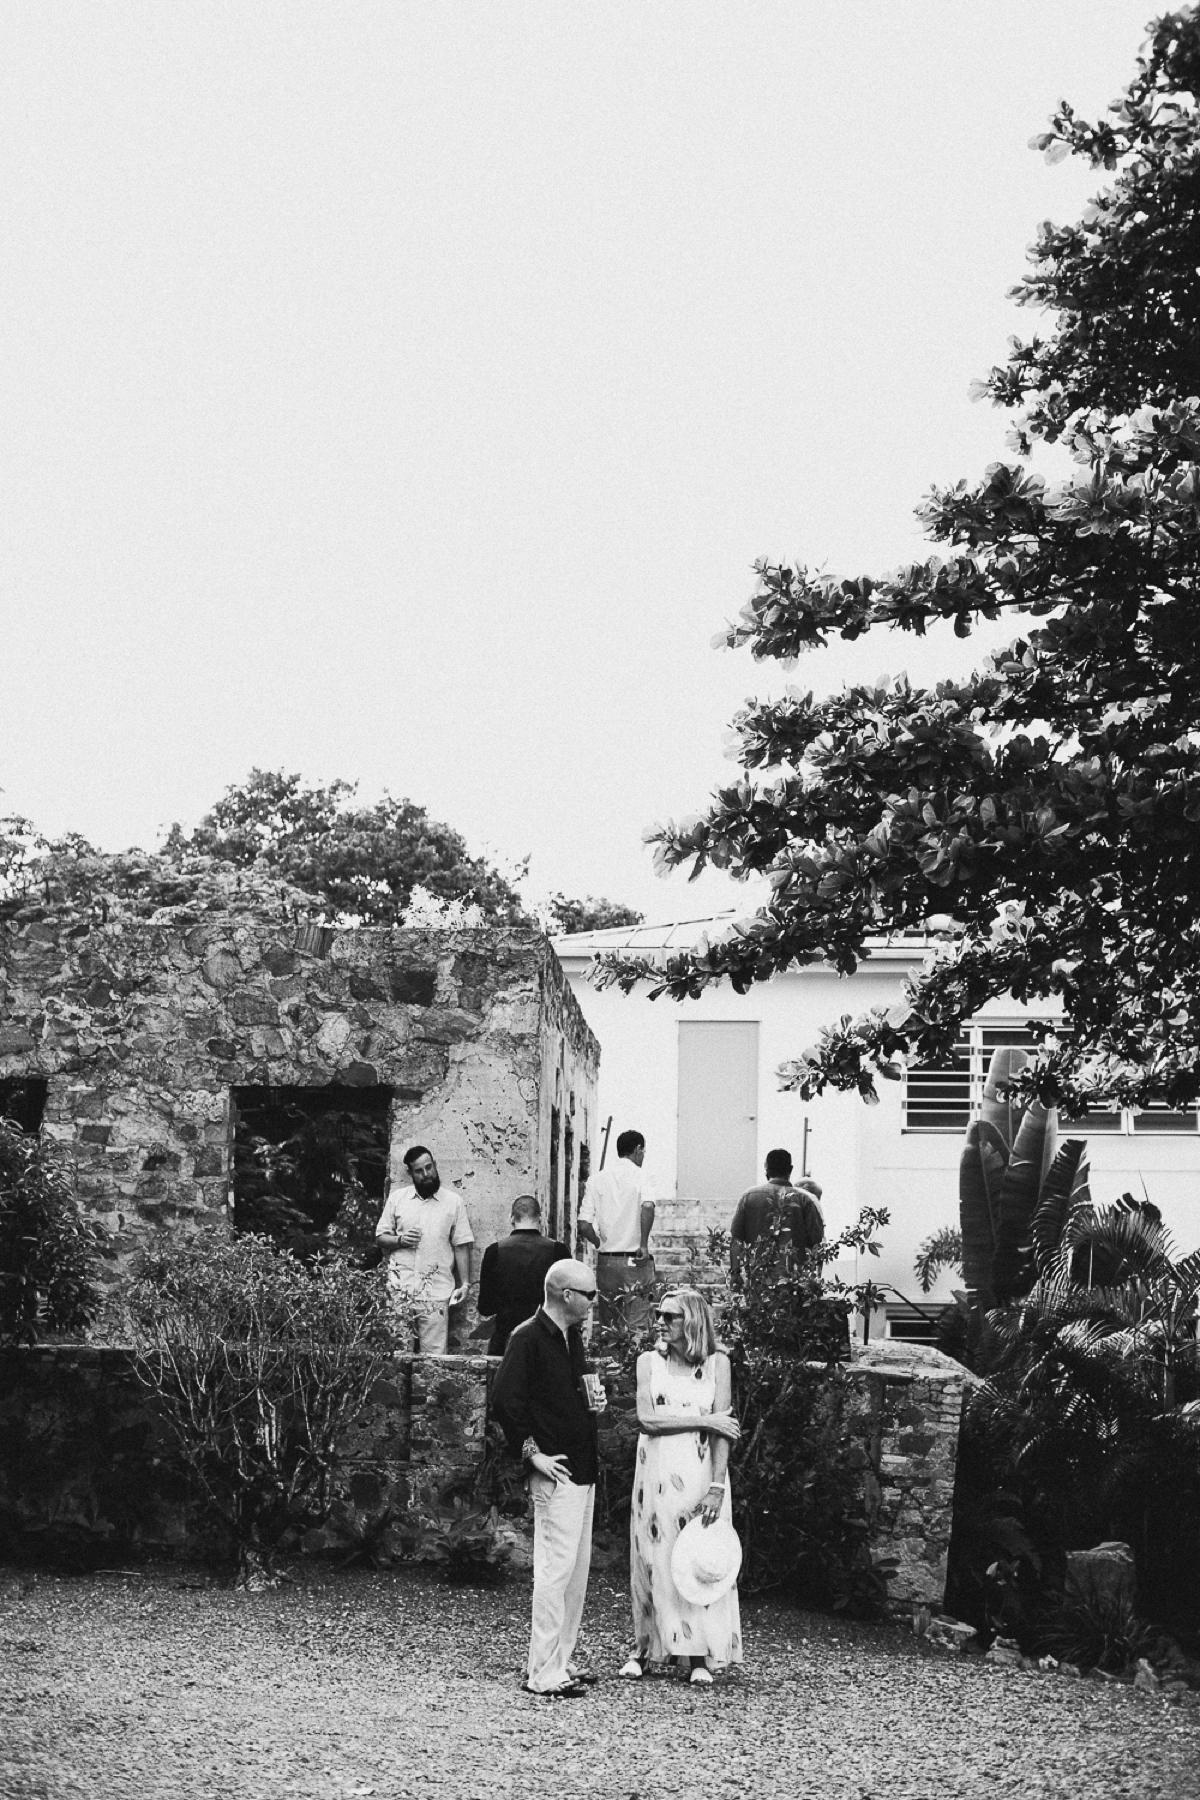 St_Croix_Wedding_Abi_Q_Photography_-144.jpg